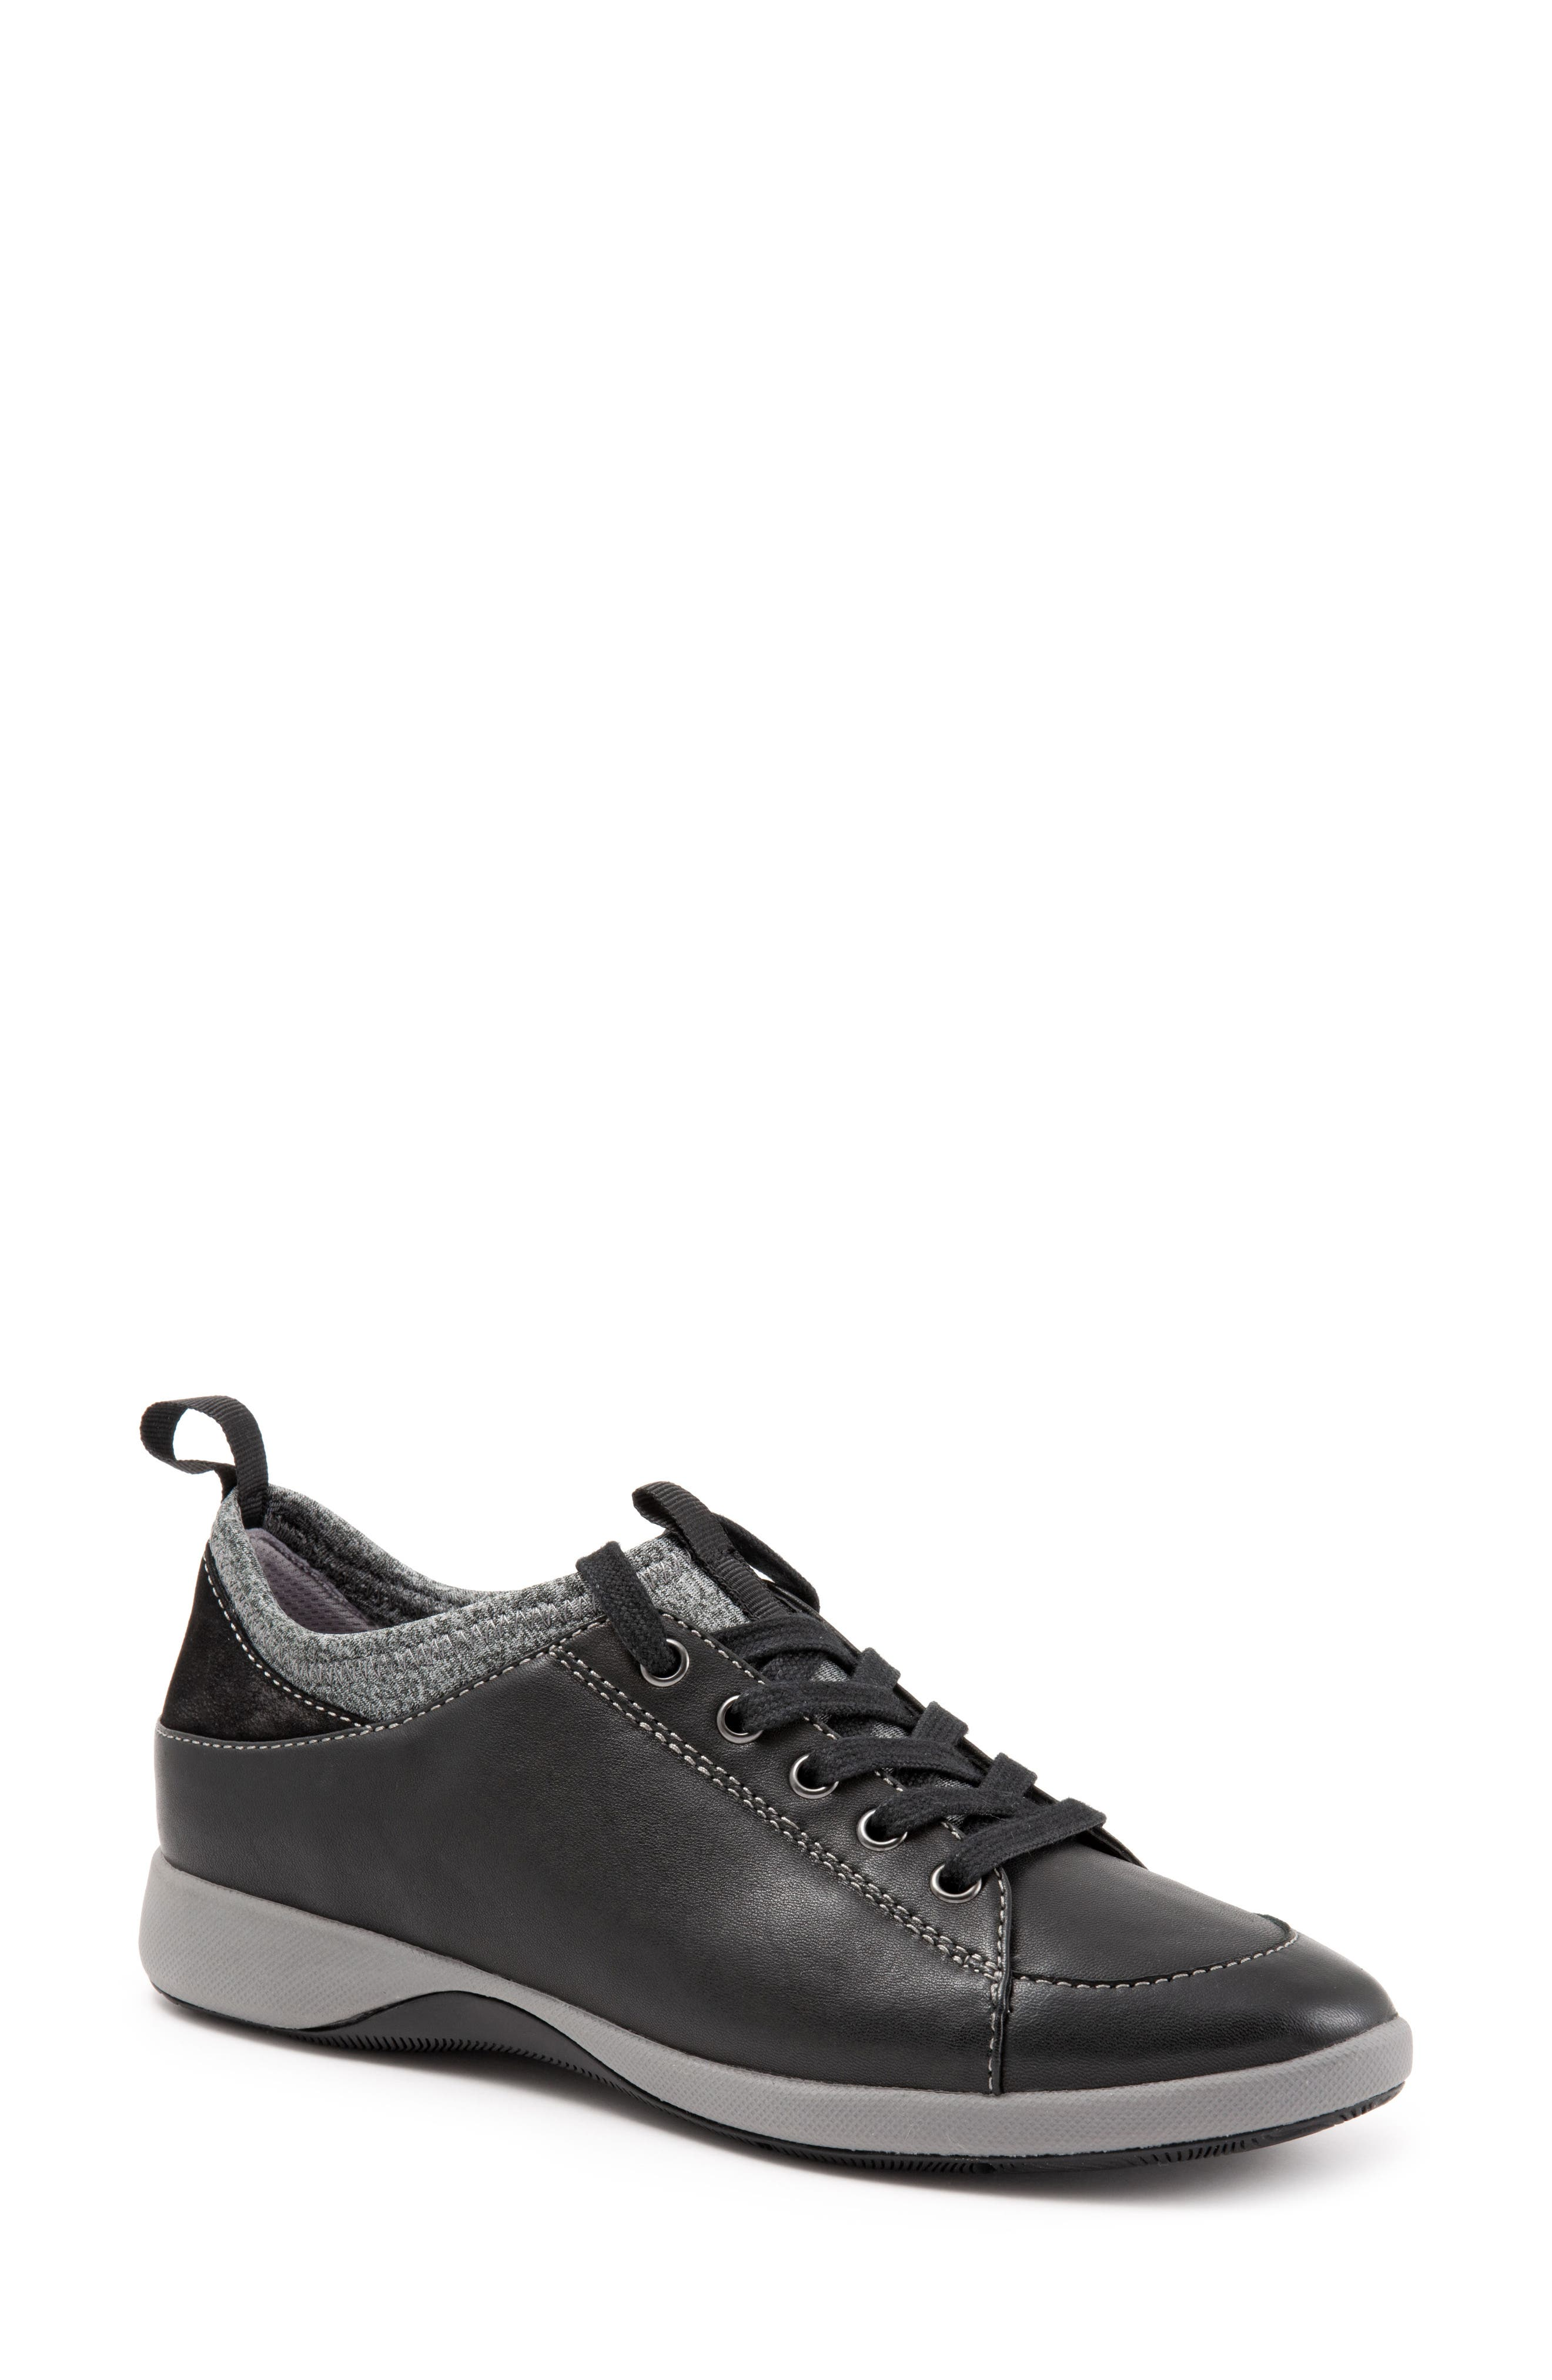 SOFTWALK<SUP>®</SUP>, SAVA Haven Sneaker, Alternate thumbnail 8, color, BLACK/ GREY LEATHER